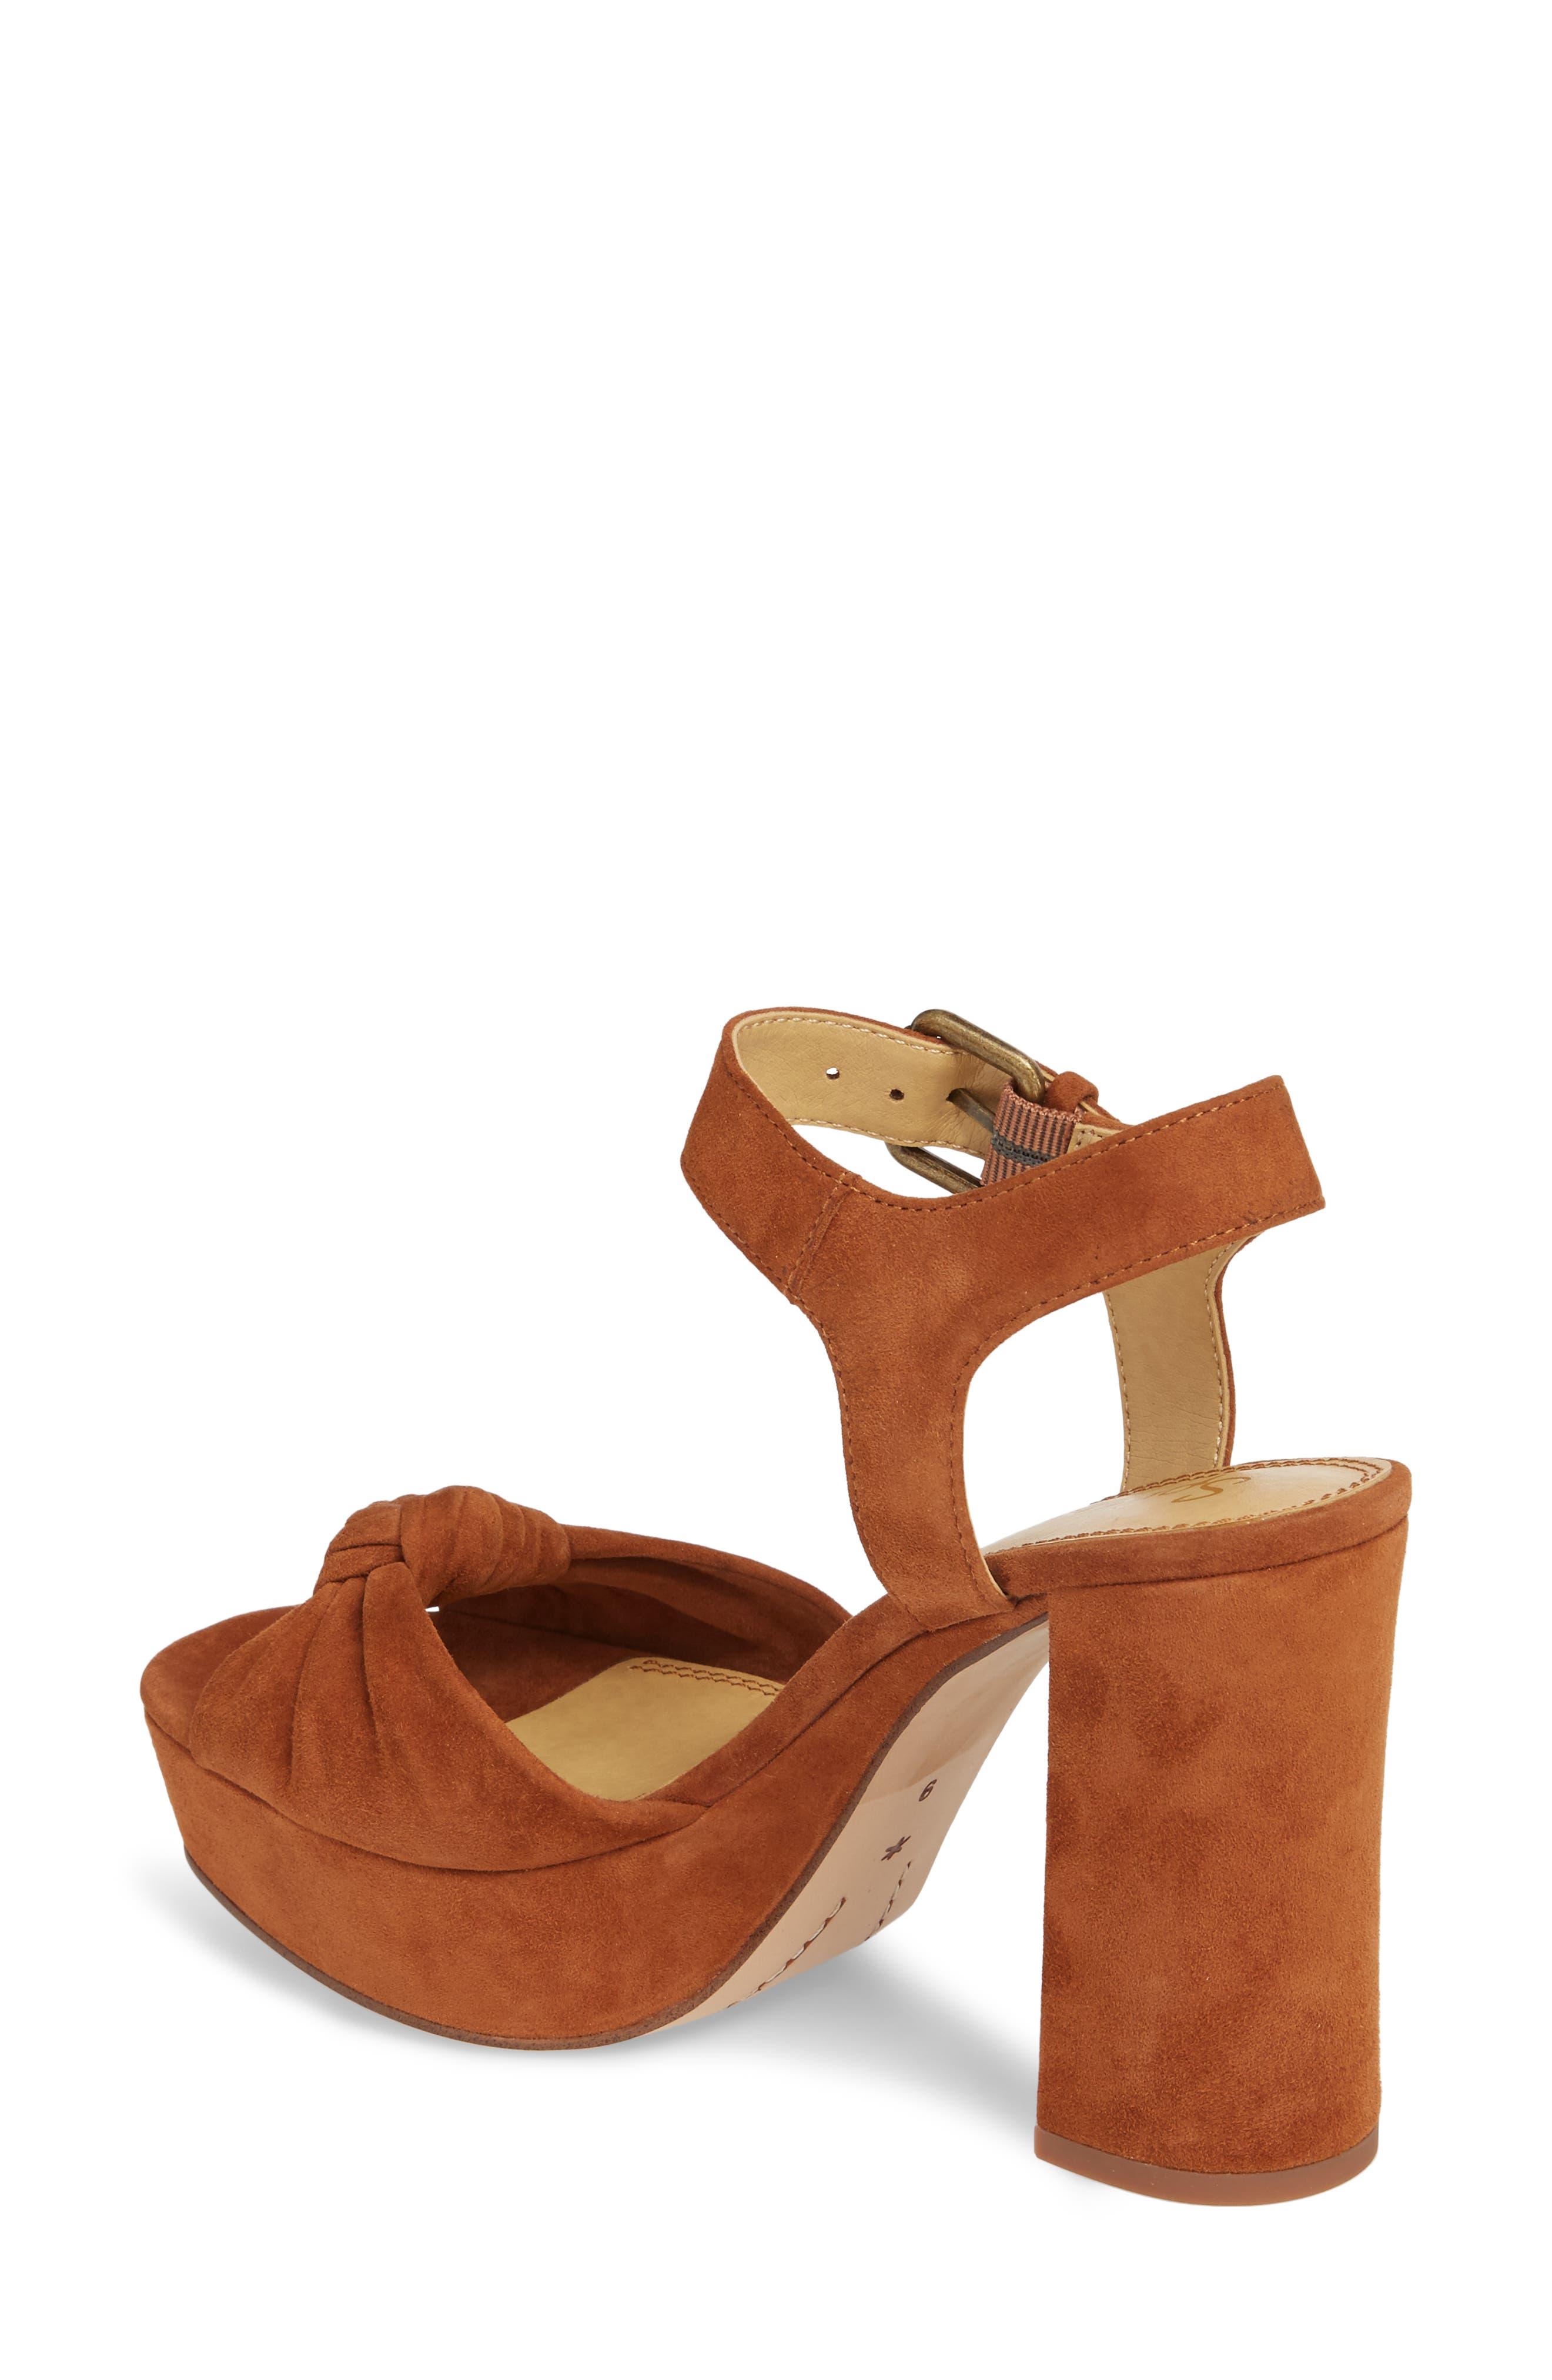 Bates Platform Sandal,                             Alternate thumbnail 2, color,                             Caramel Suede